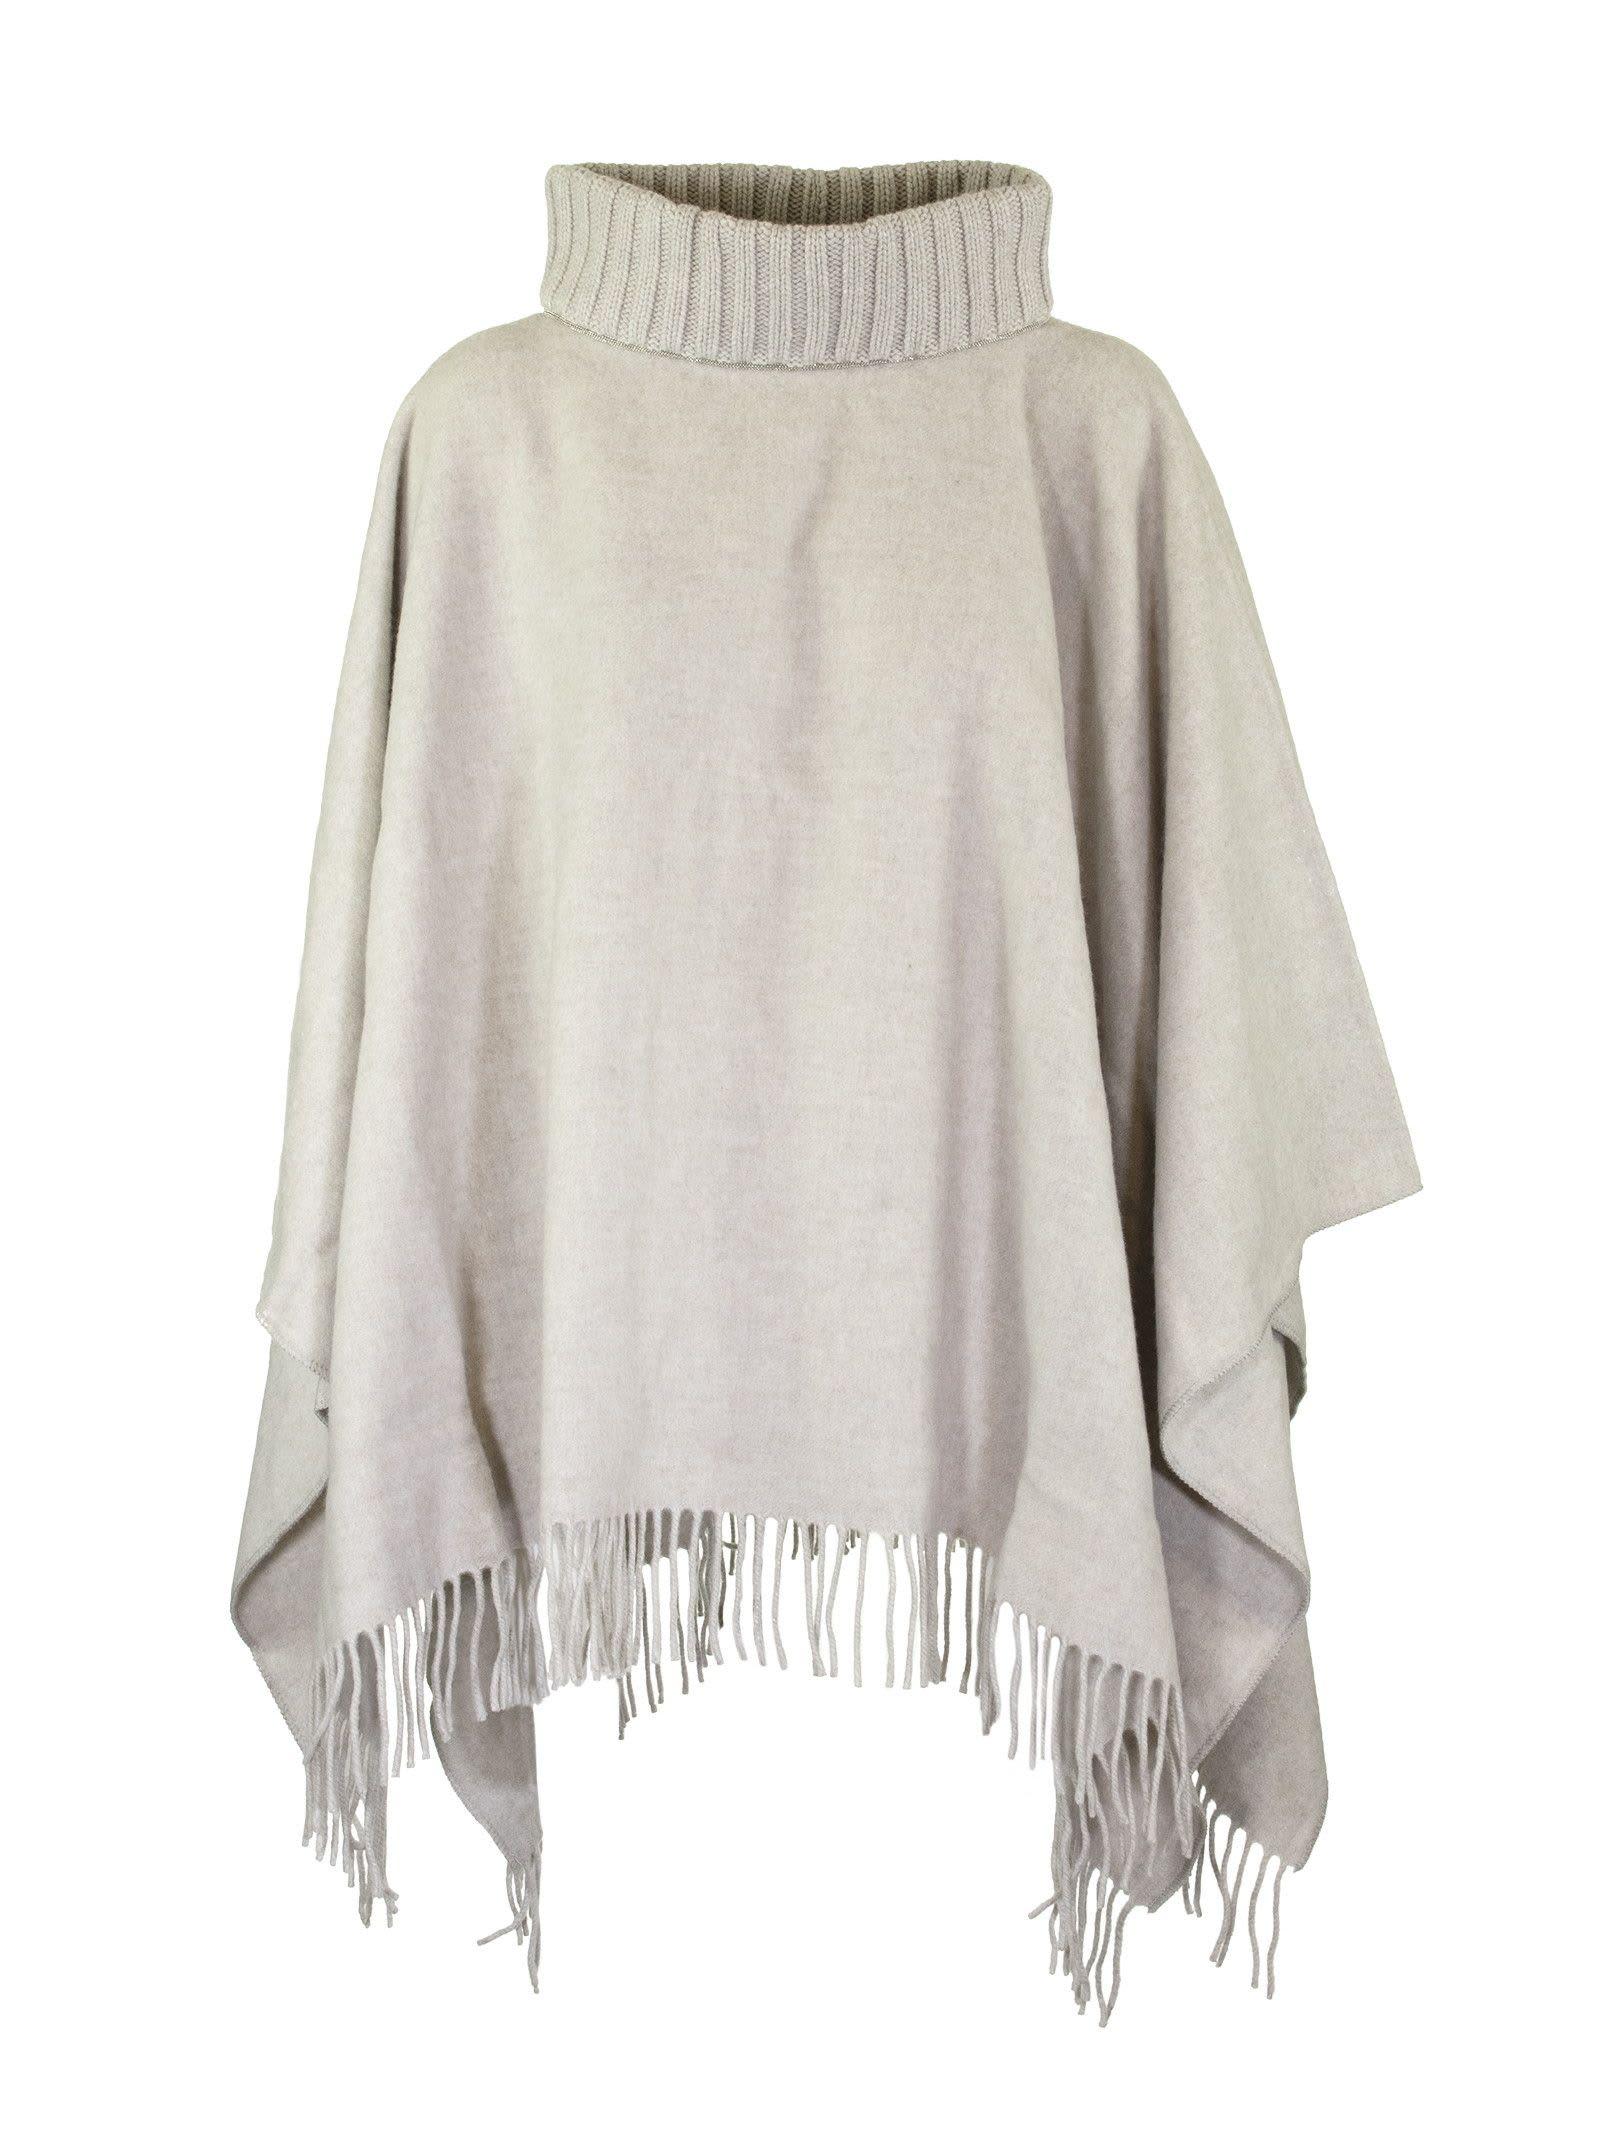 Fabiana Filippi Woven Wool And Cashmere Cloak